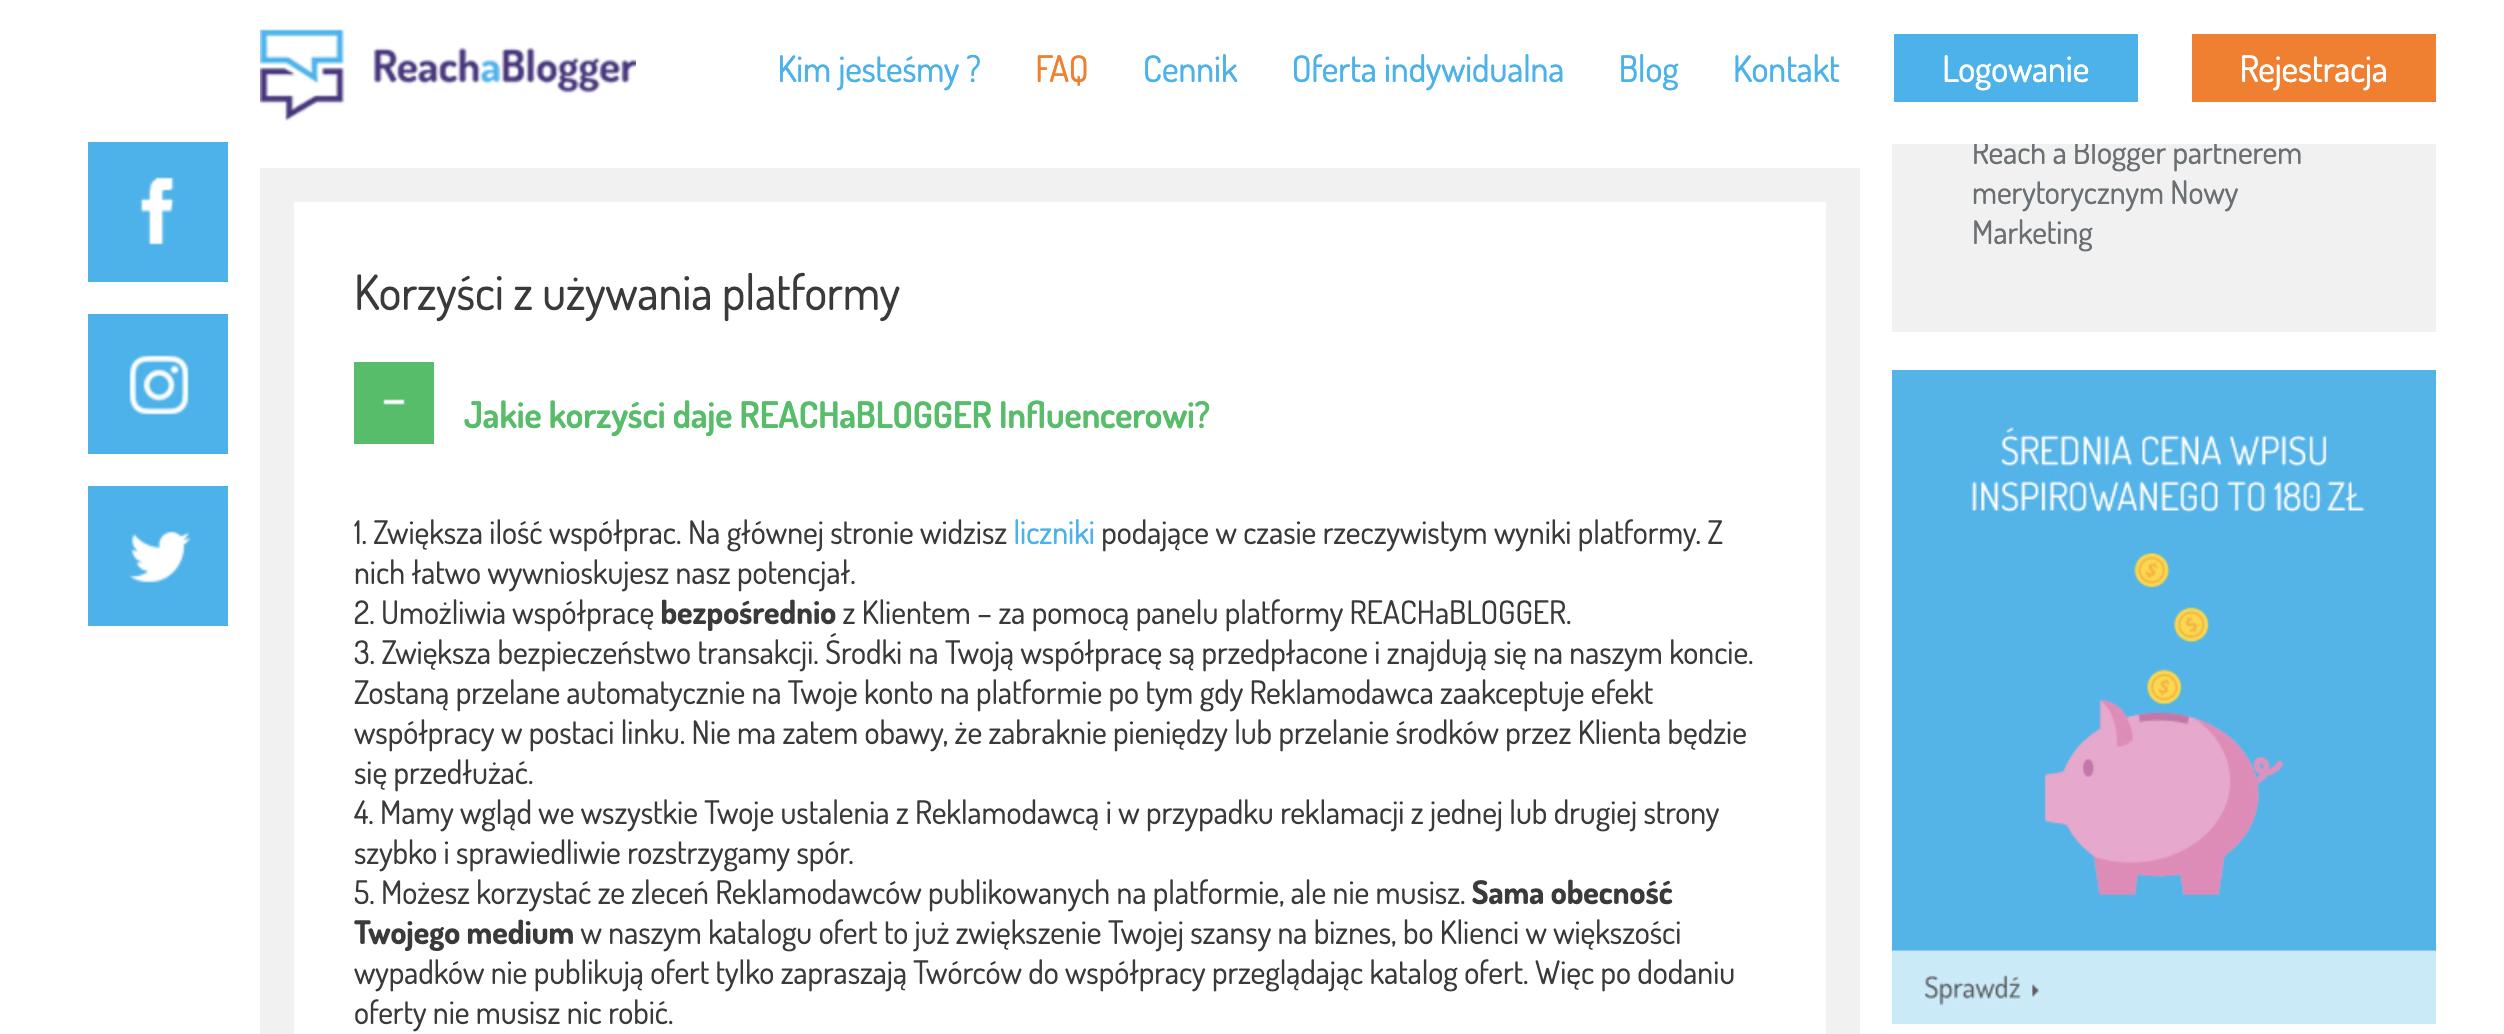 reachablogger platforma współpracy z blogerami